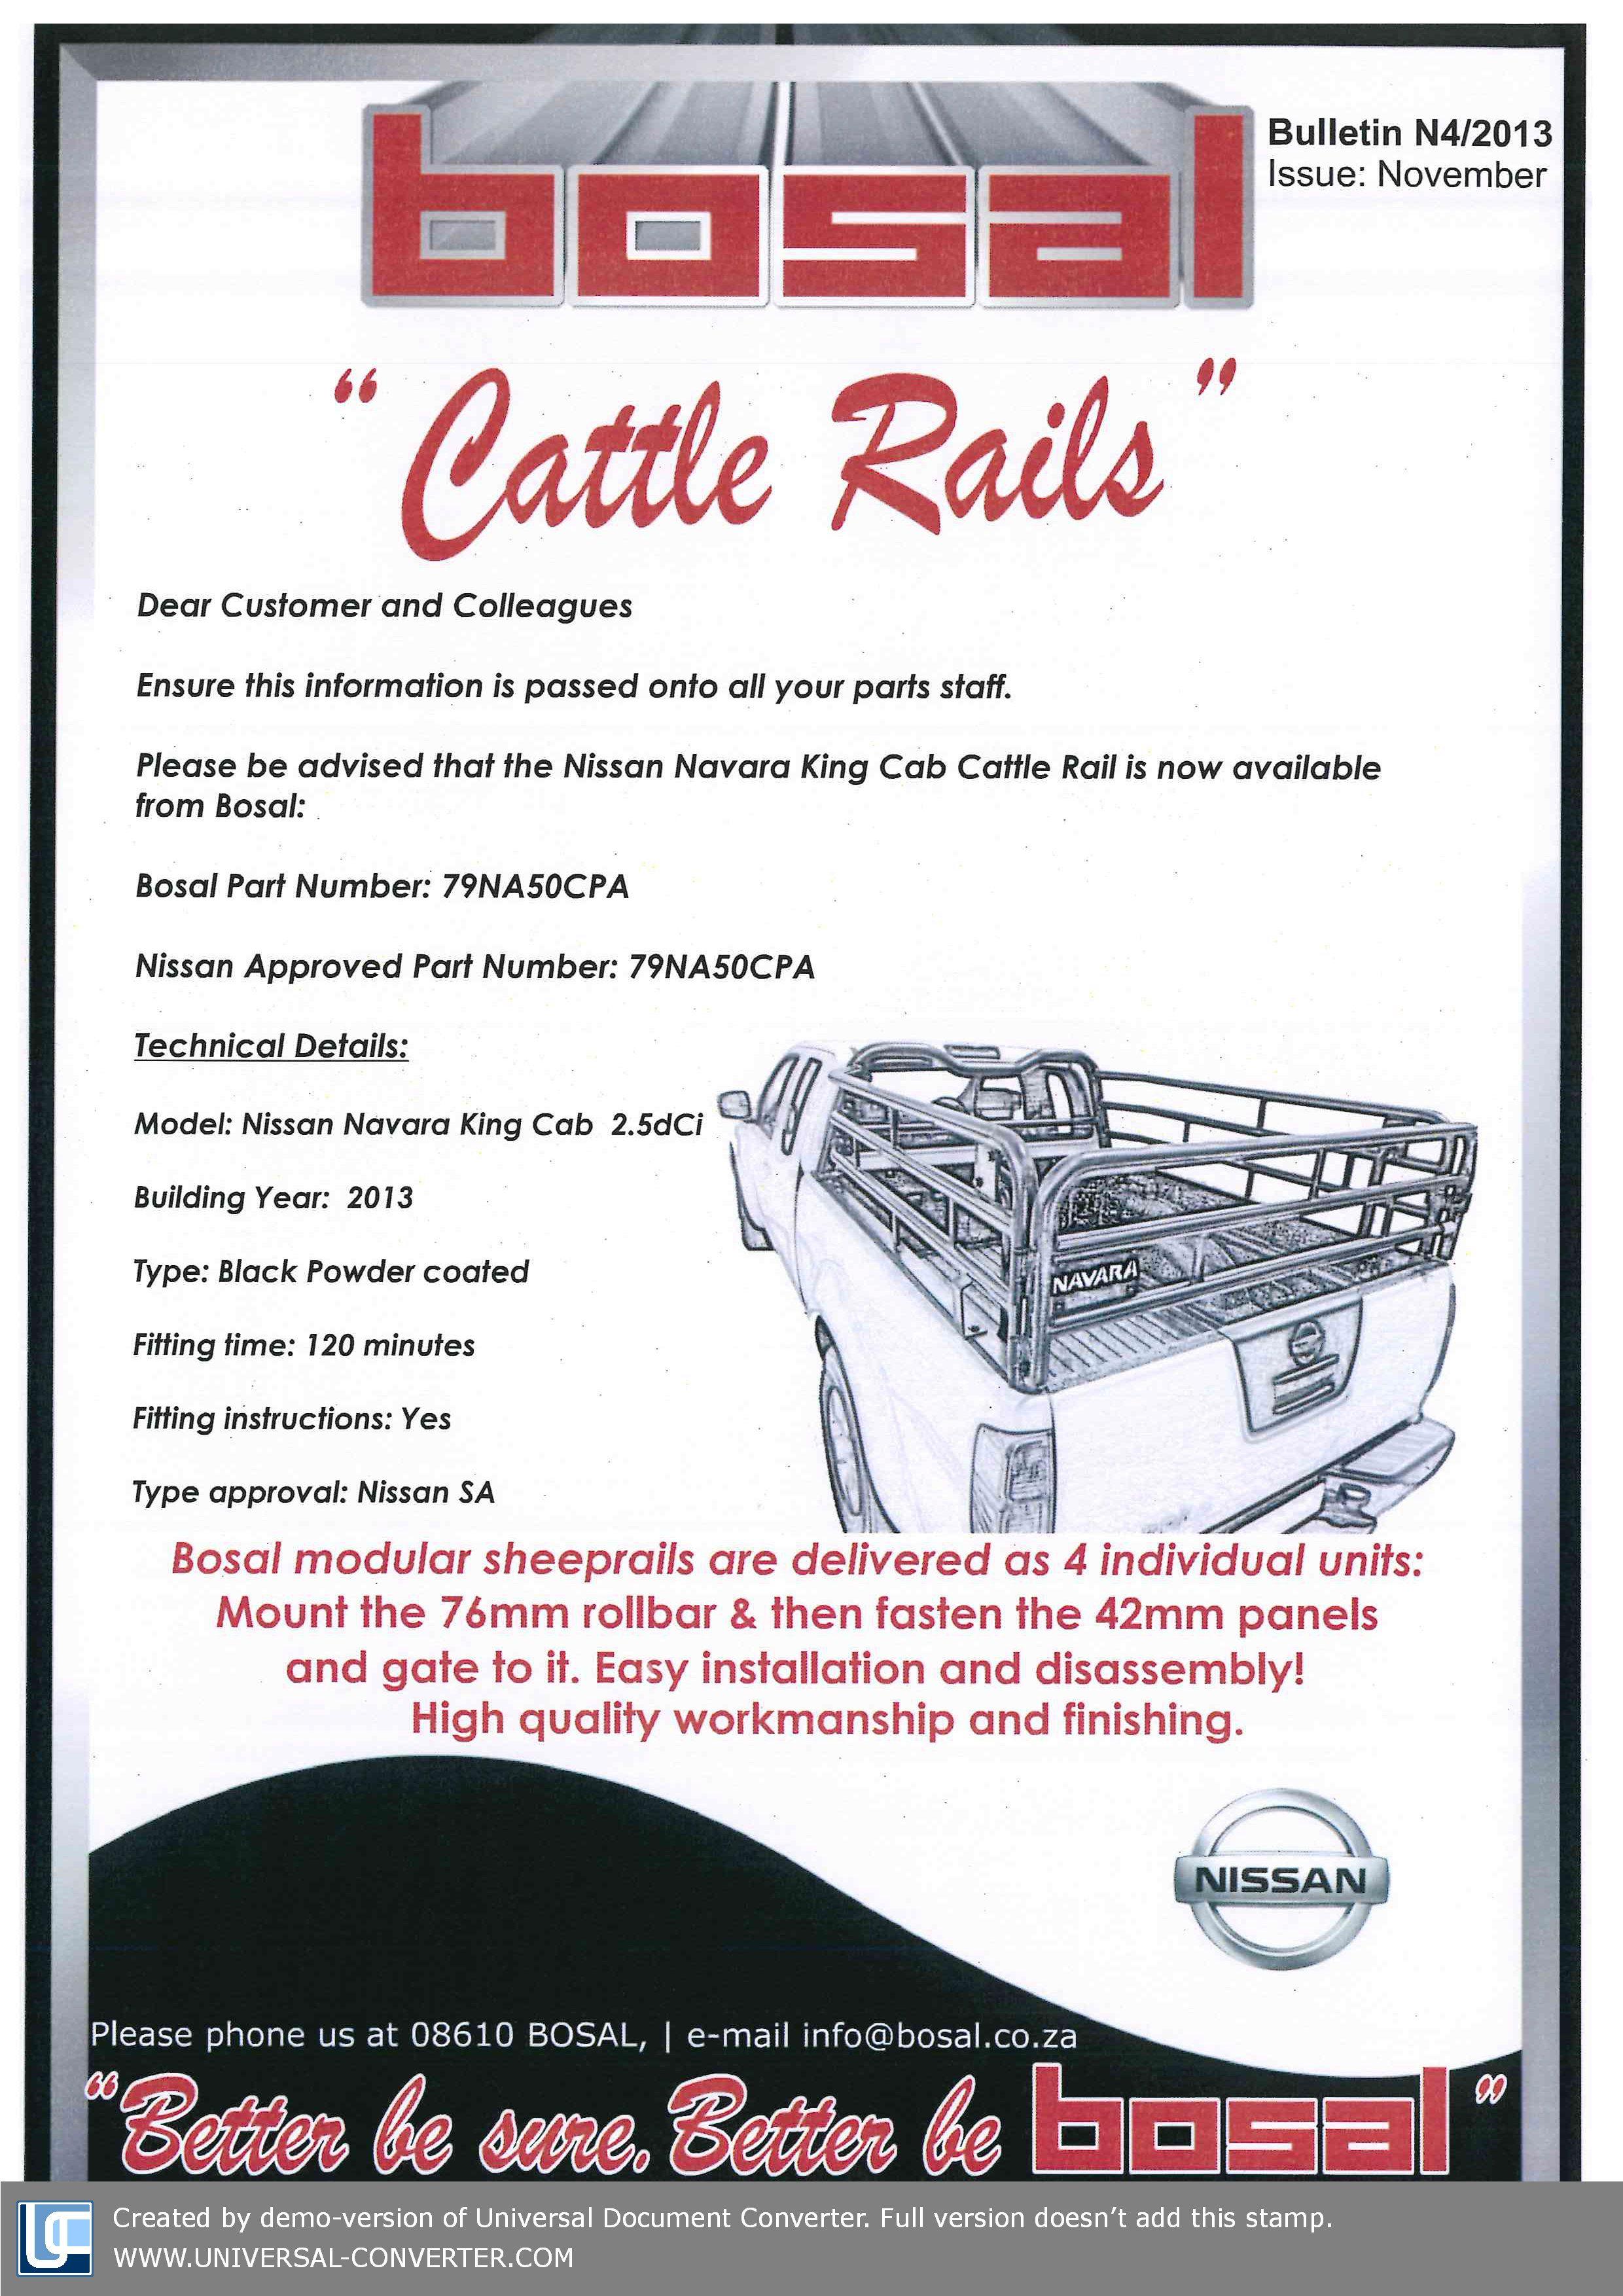 Cattle Rails - Nissan Navara King Cab | BOSAL General | Pinterest